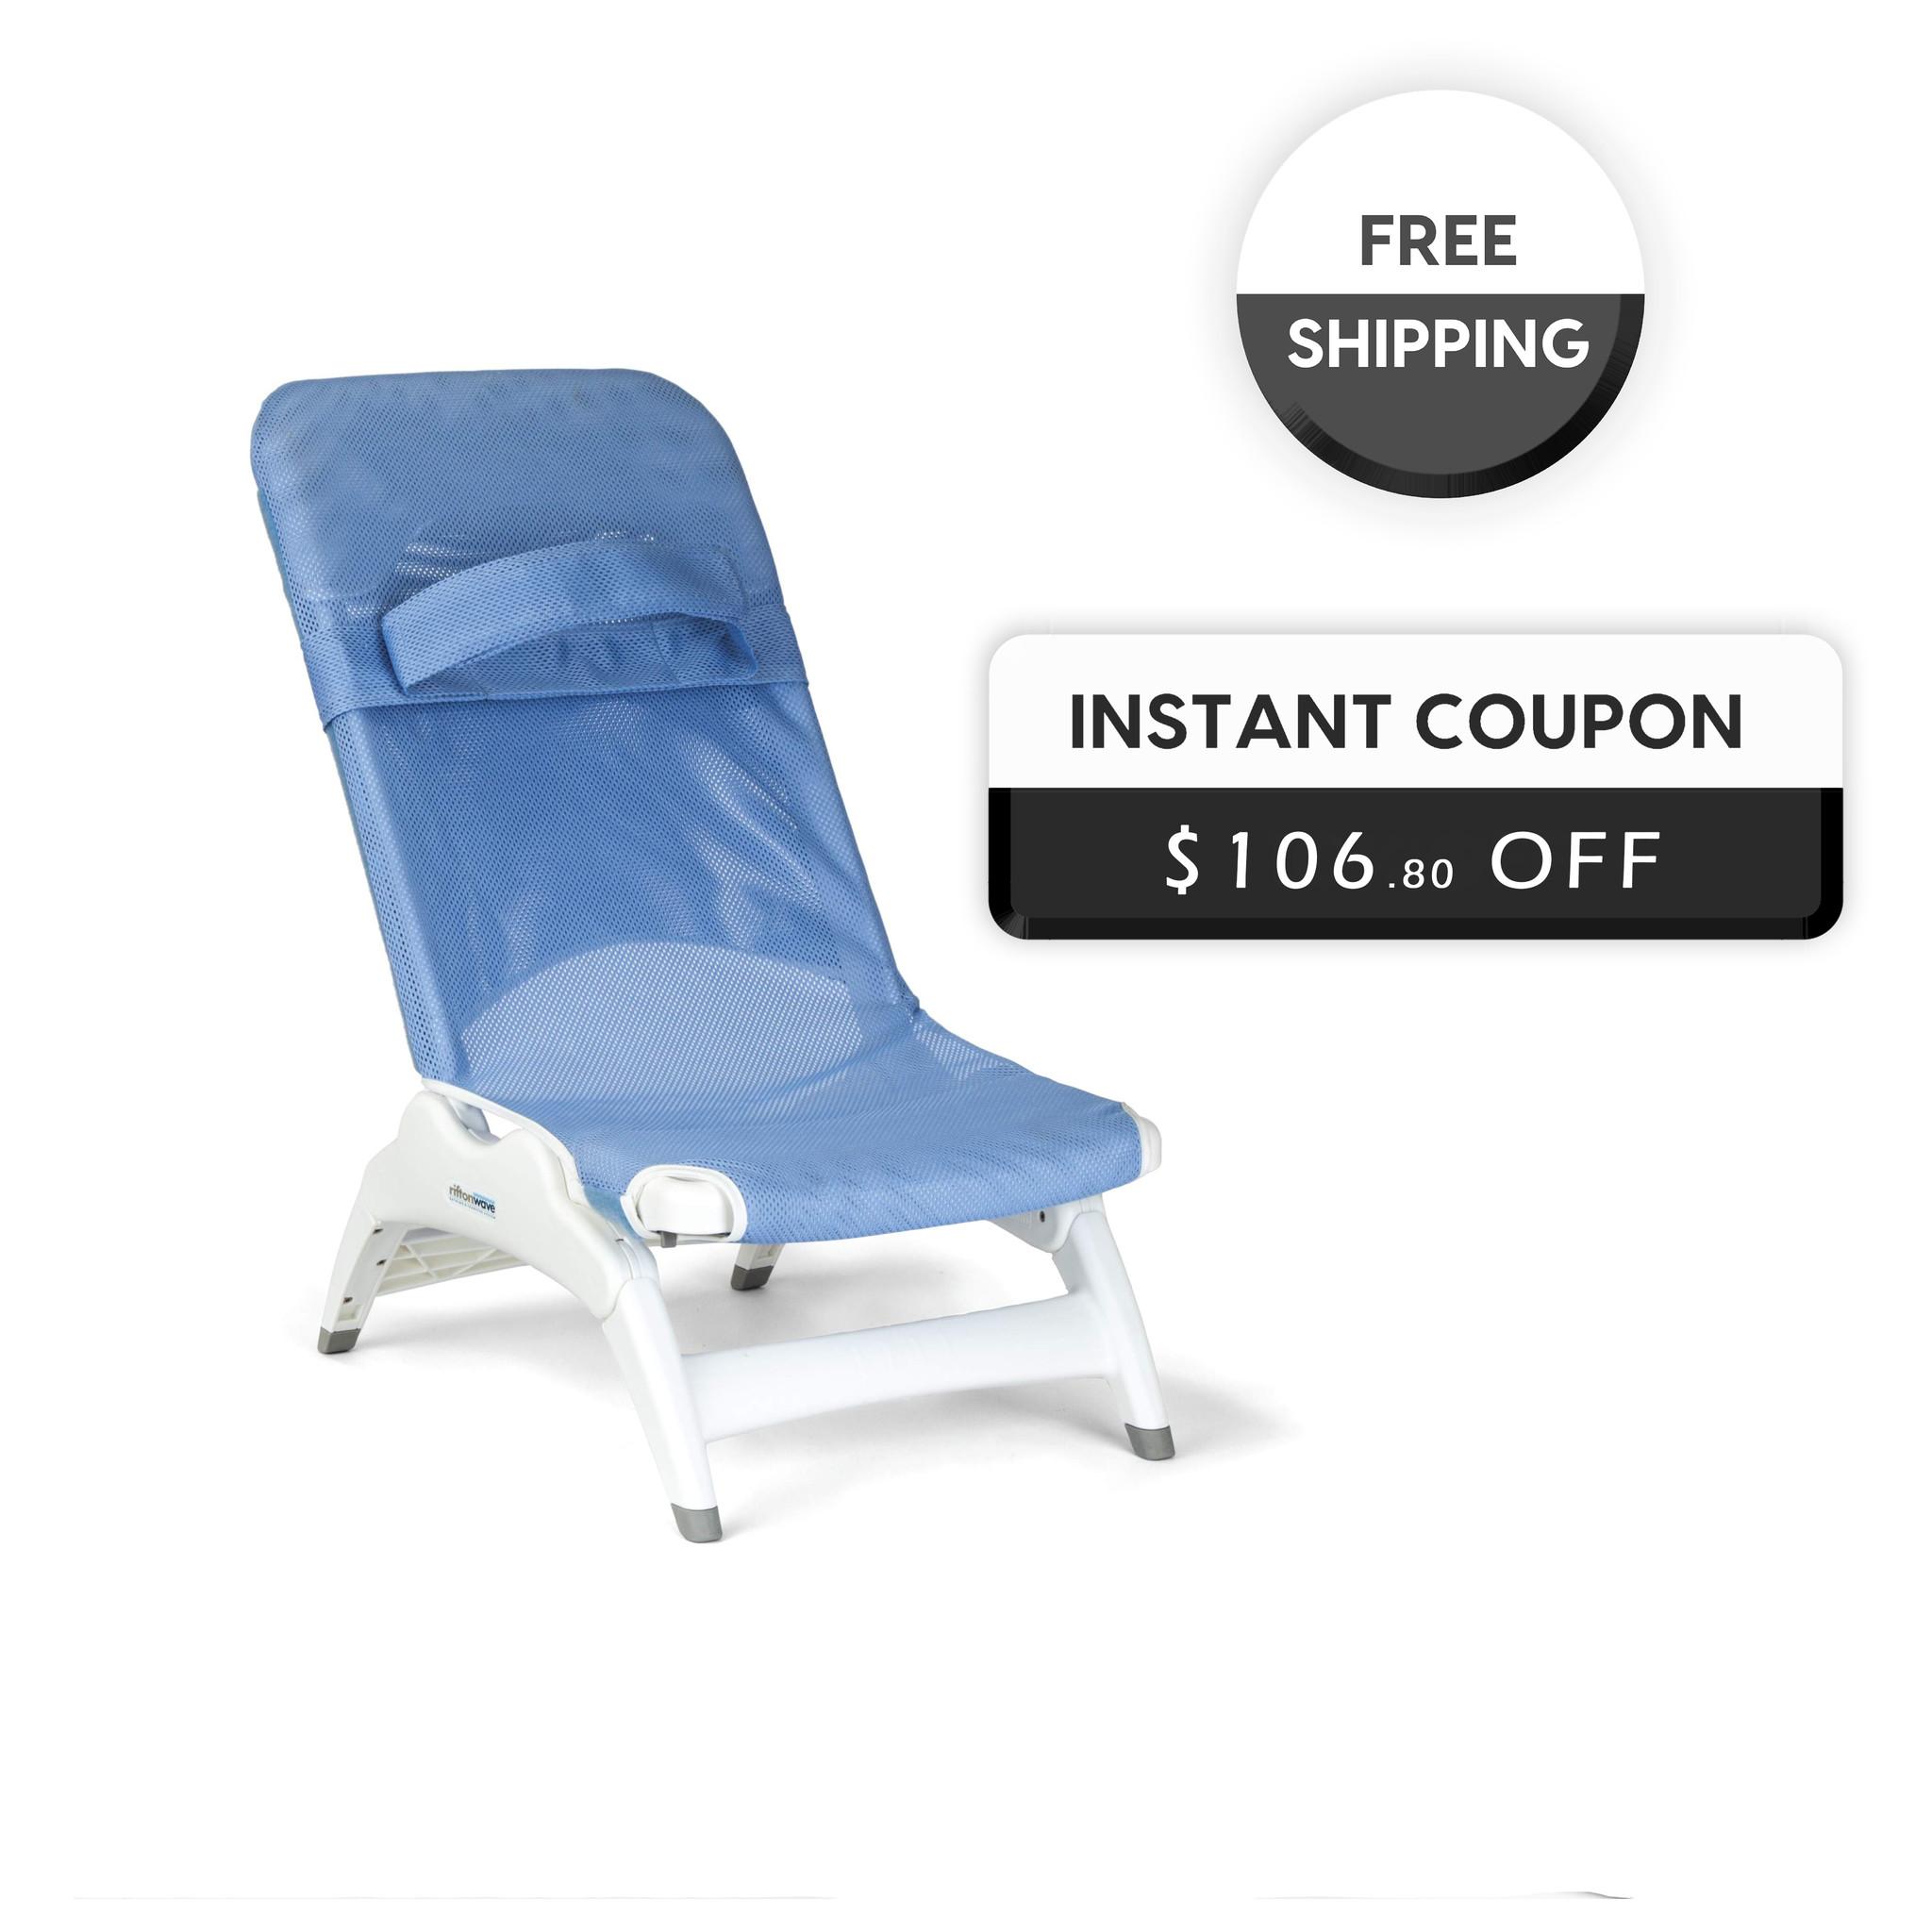 rifton wave medium bath chair with discount free shipping